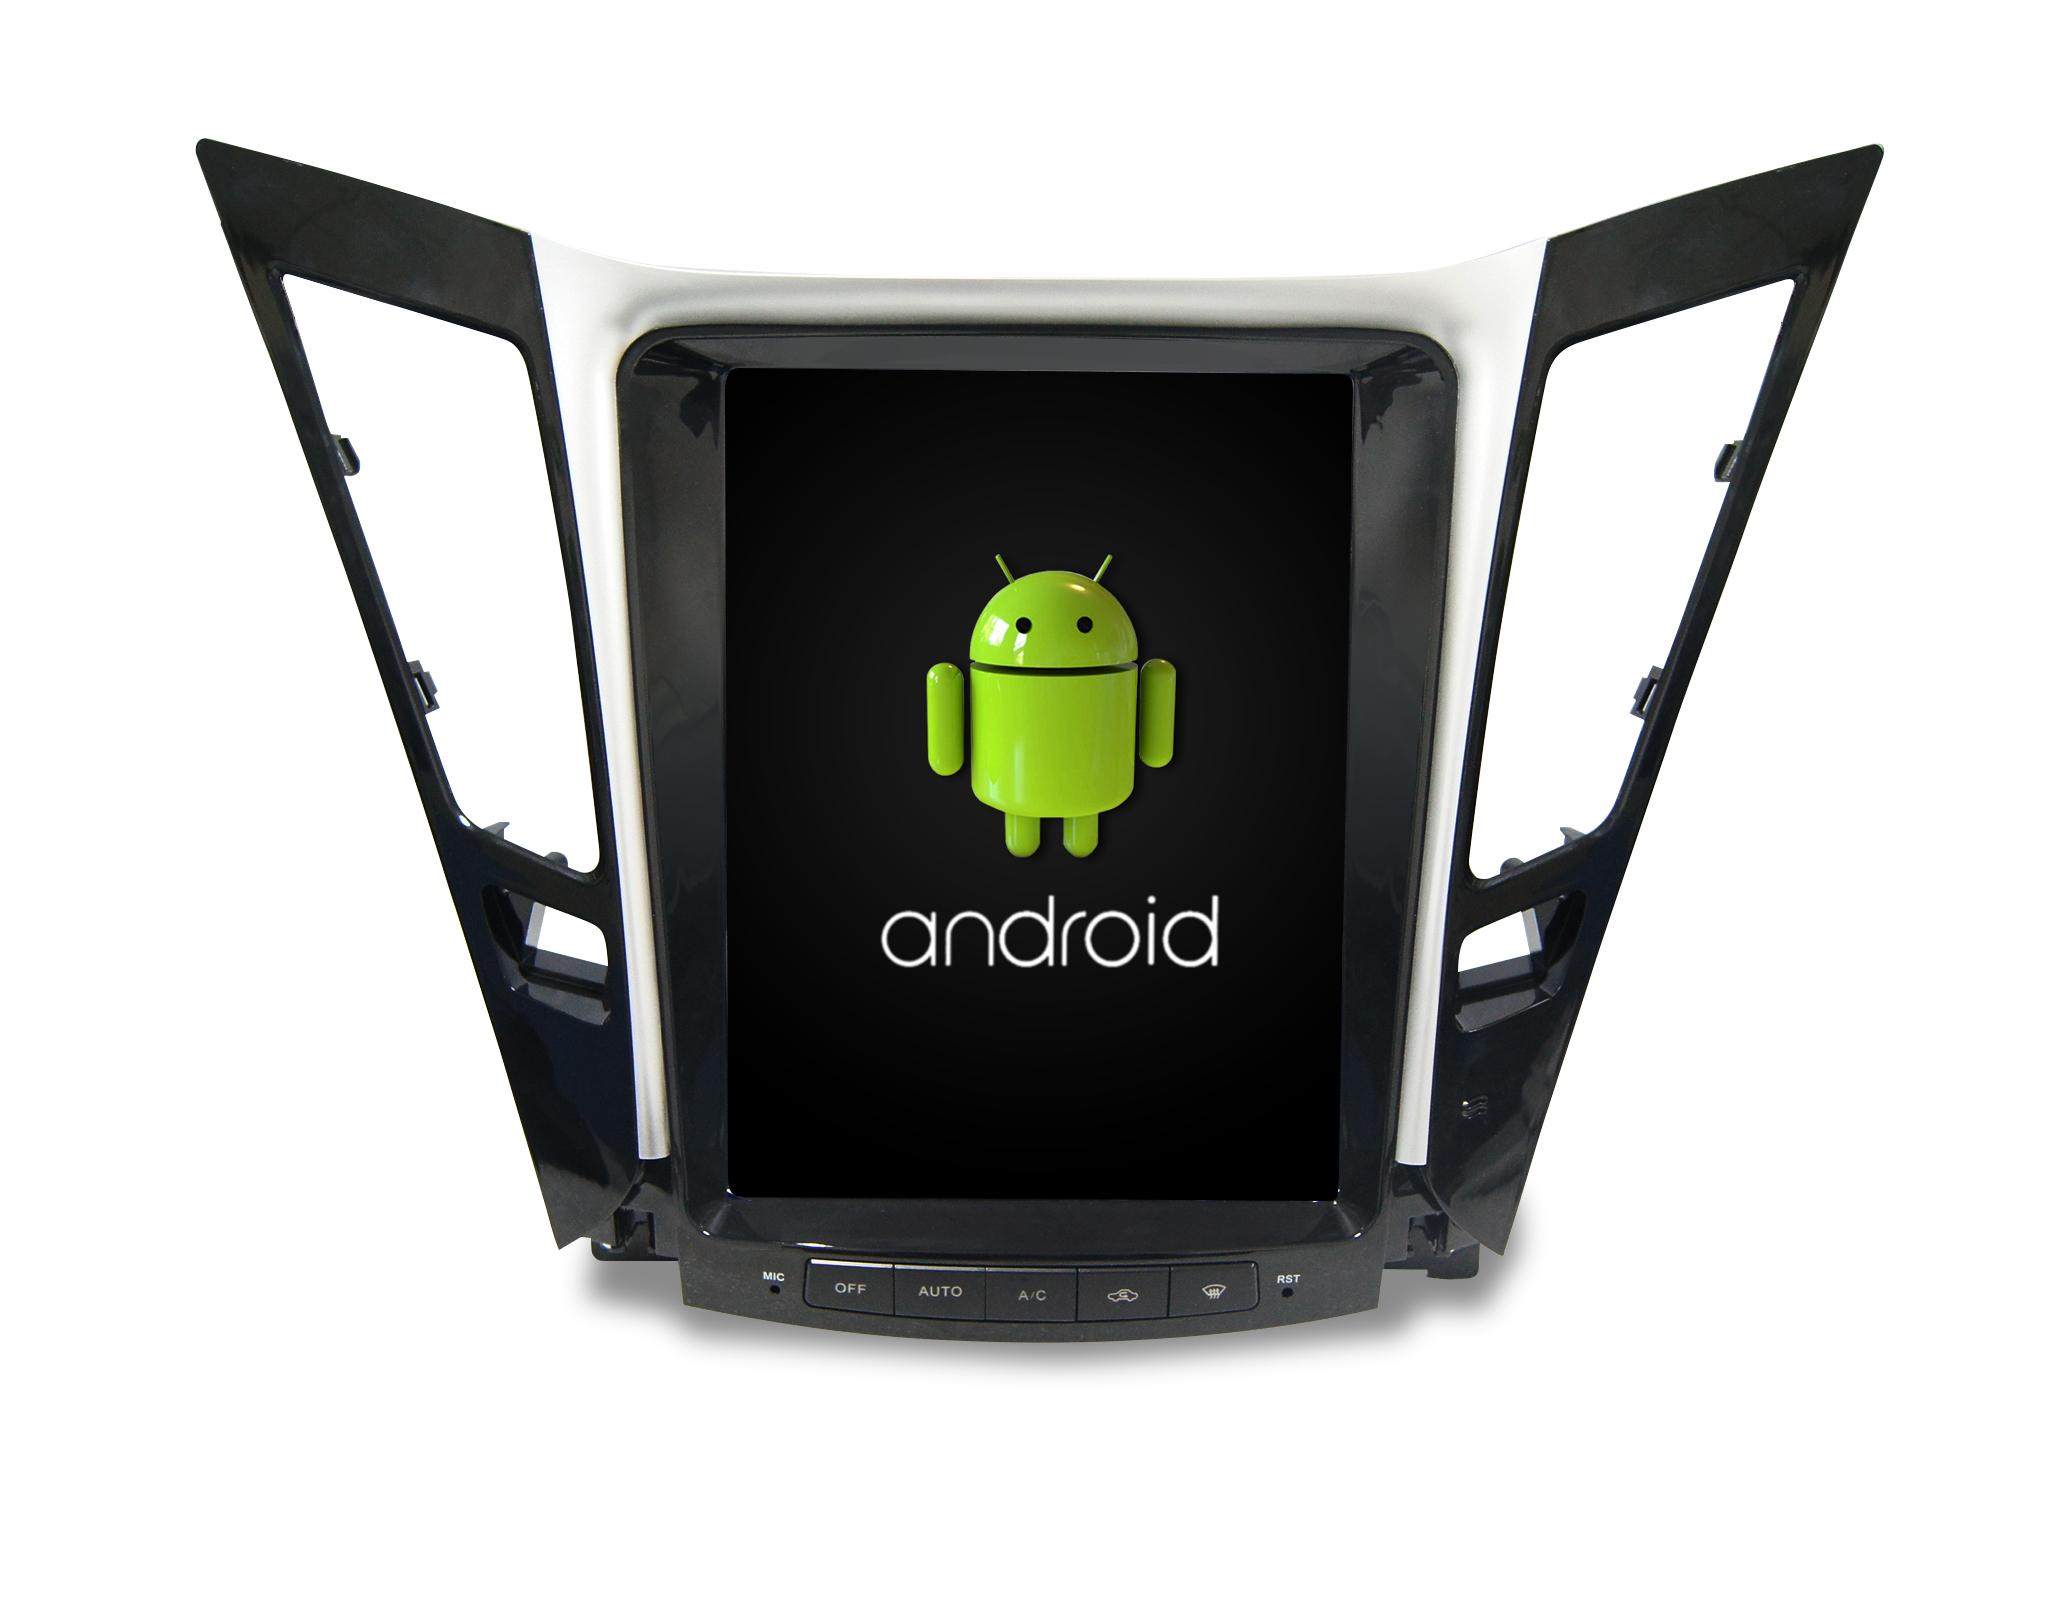 Штатная магнитола CARMEDIA SP-10405 Tesla-Style для Hyundai Sonata YF 2010-2013 Android 7.1.2 vivibright gp90 lcd projector 3200 lumens android 4 44 os